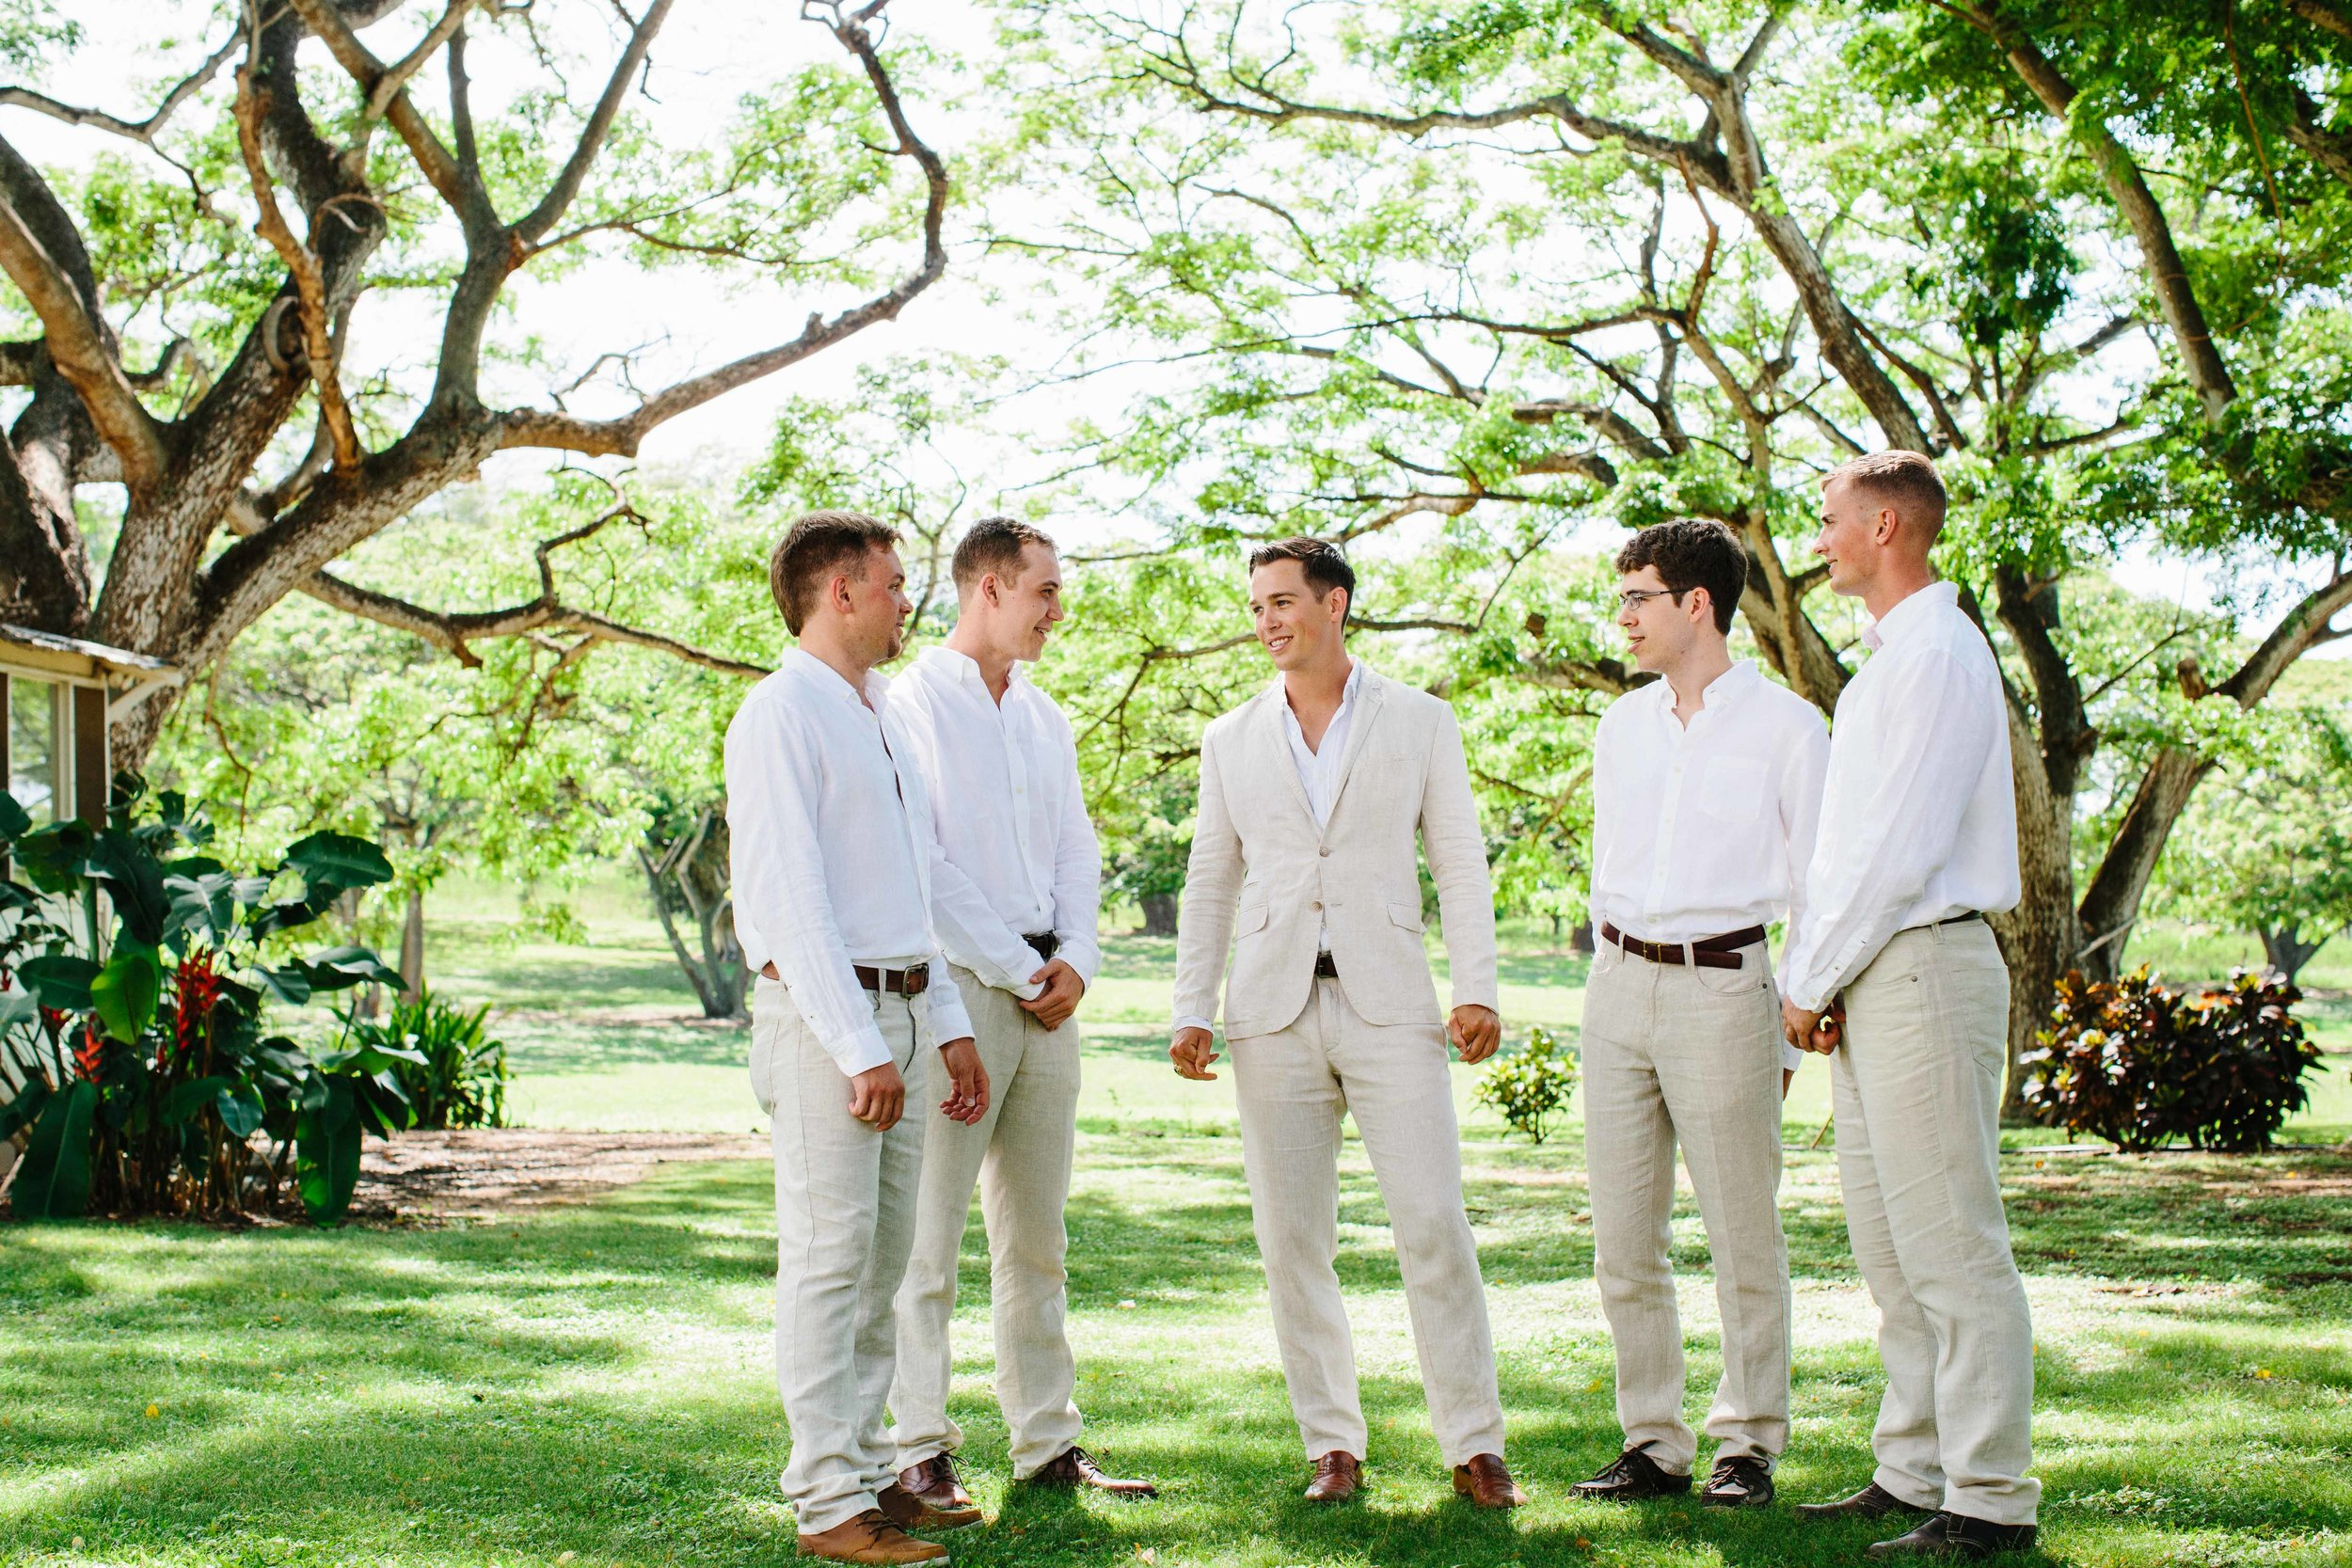 Groomsmen In Hawaii at Dillingham ranch